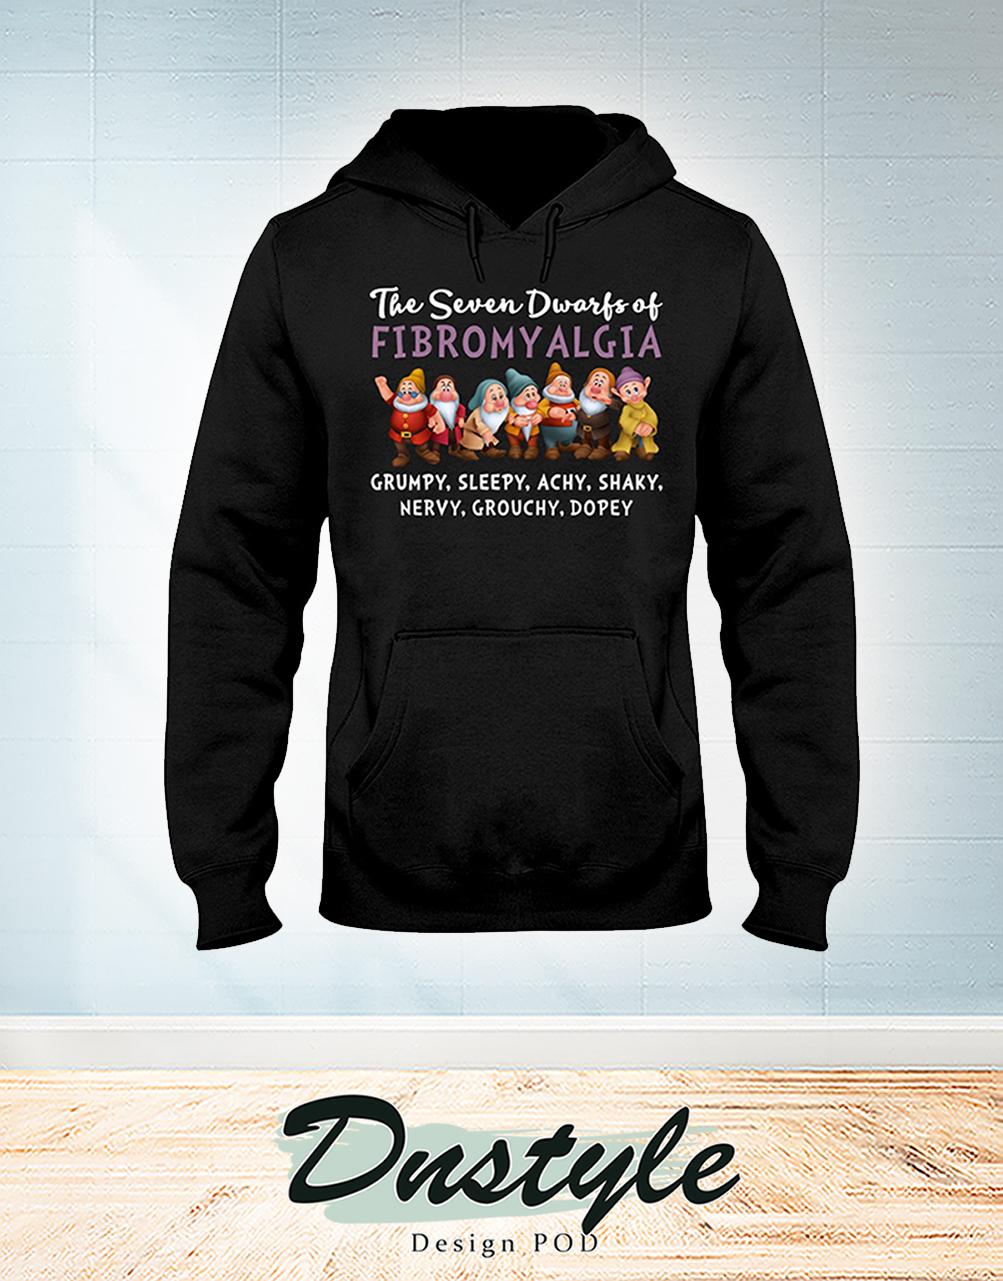 The seven dwarfs of fibromyalgia hoodie